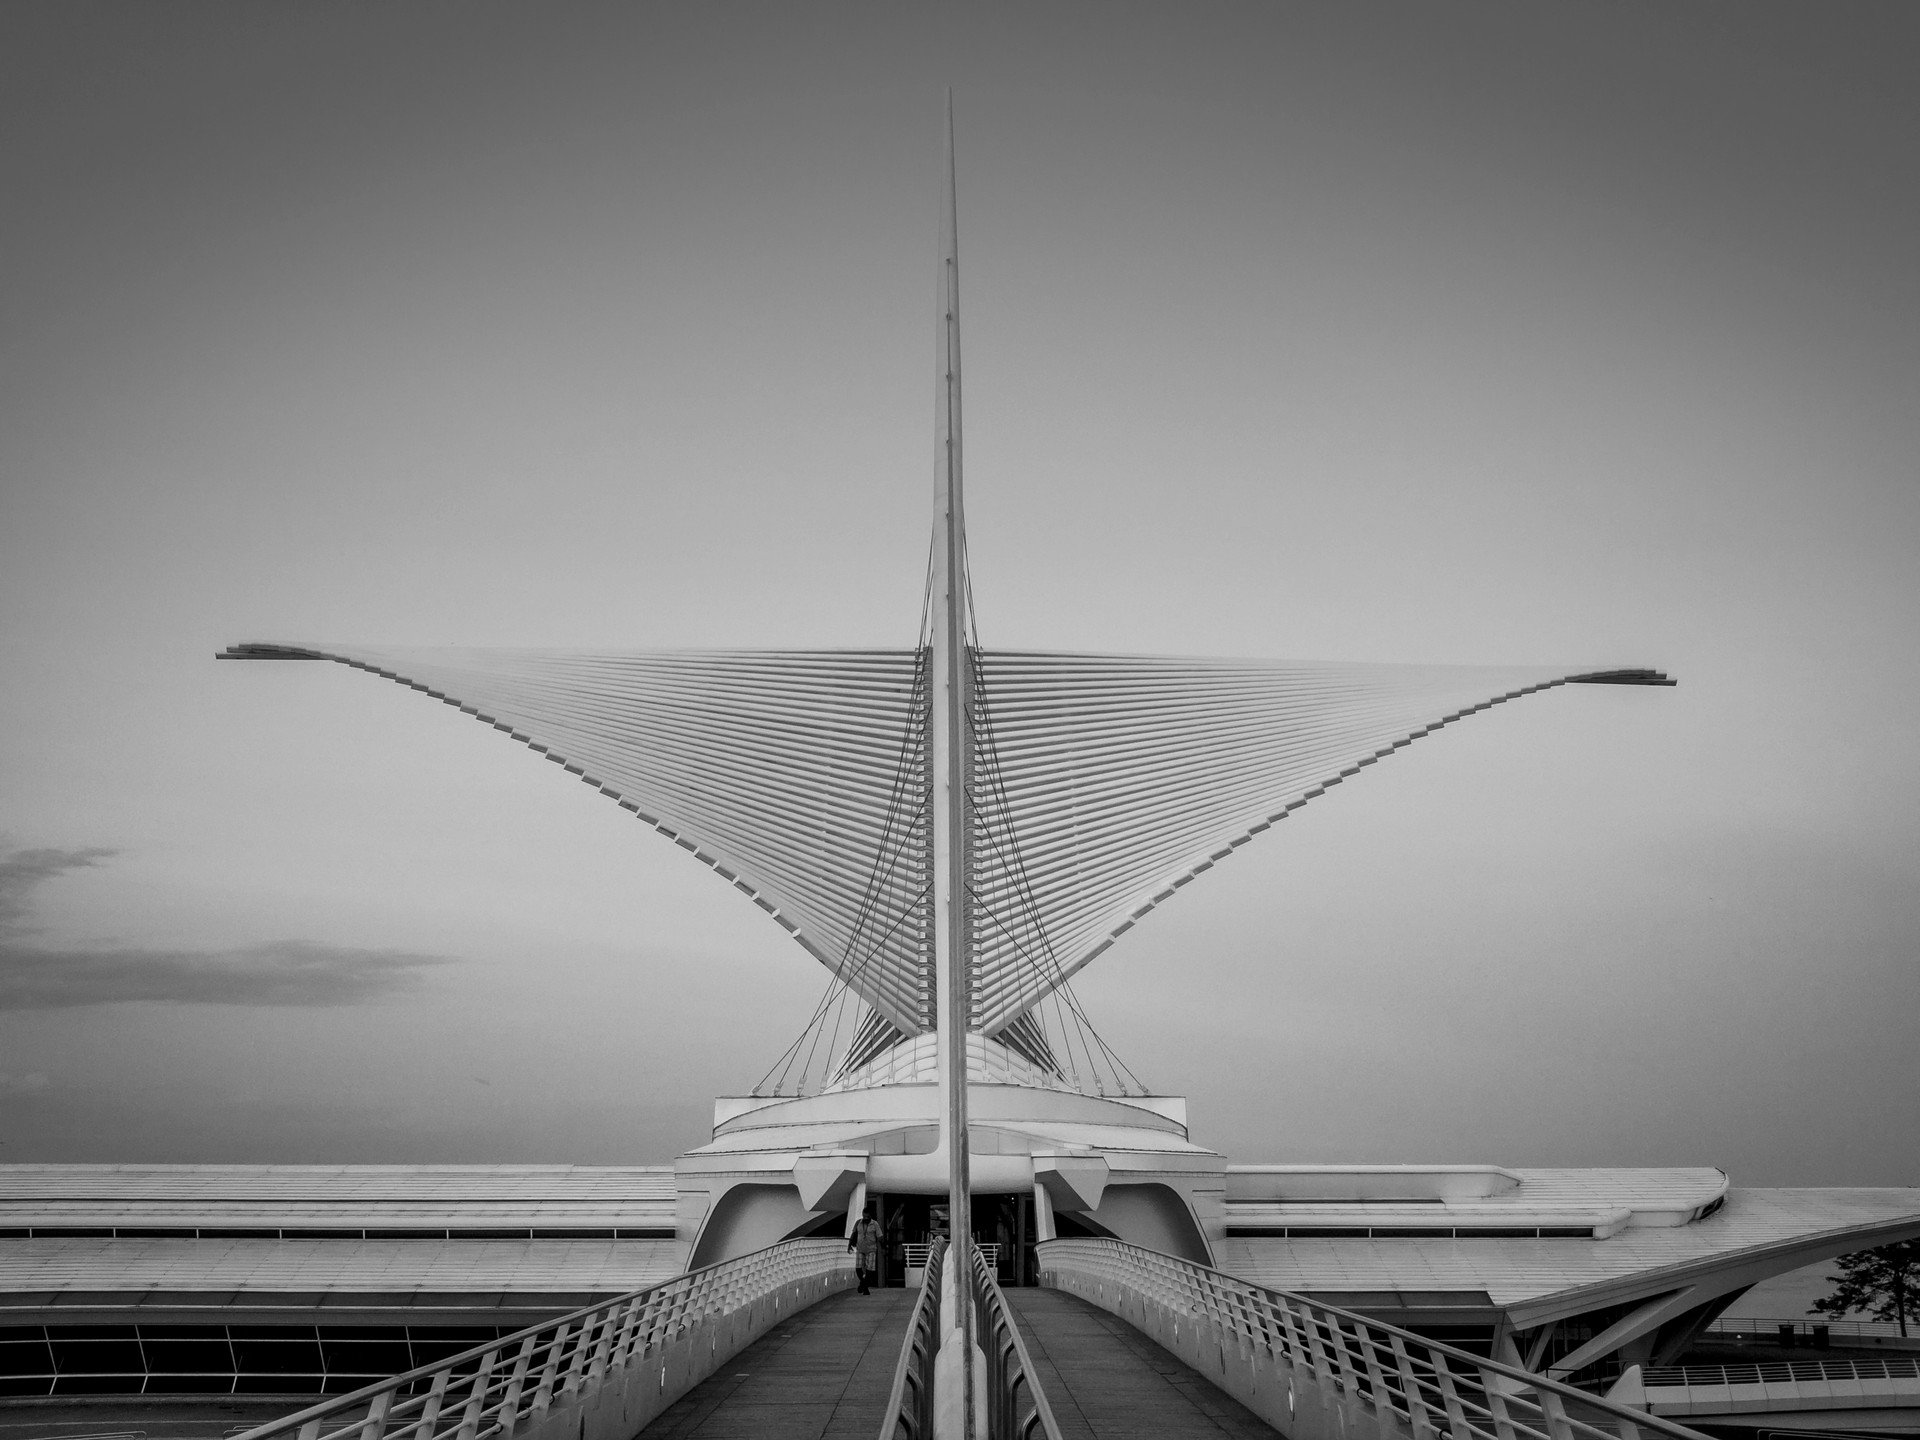 MilwaukeeArtMuseum_BW.jpg